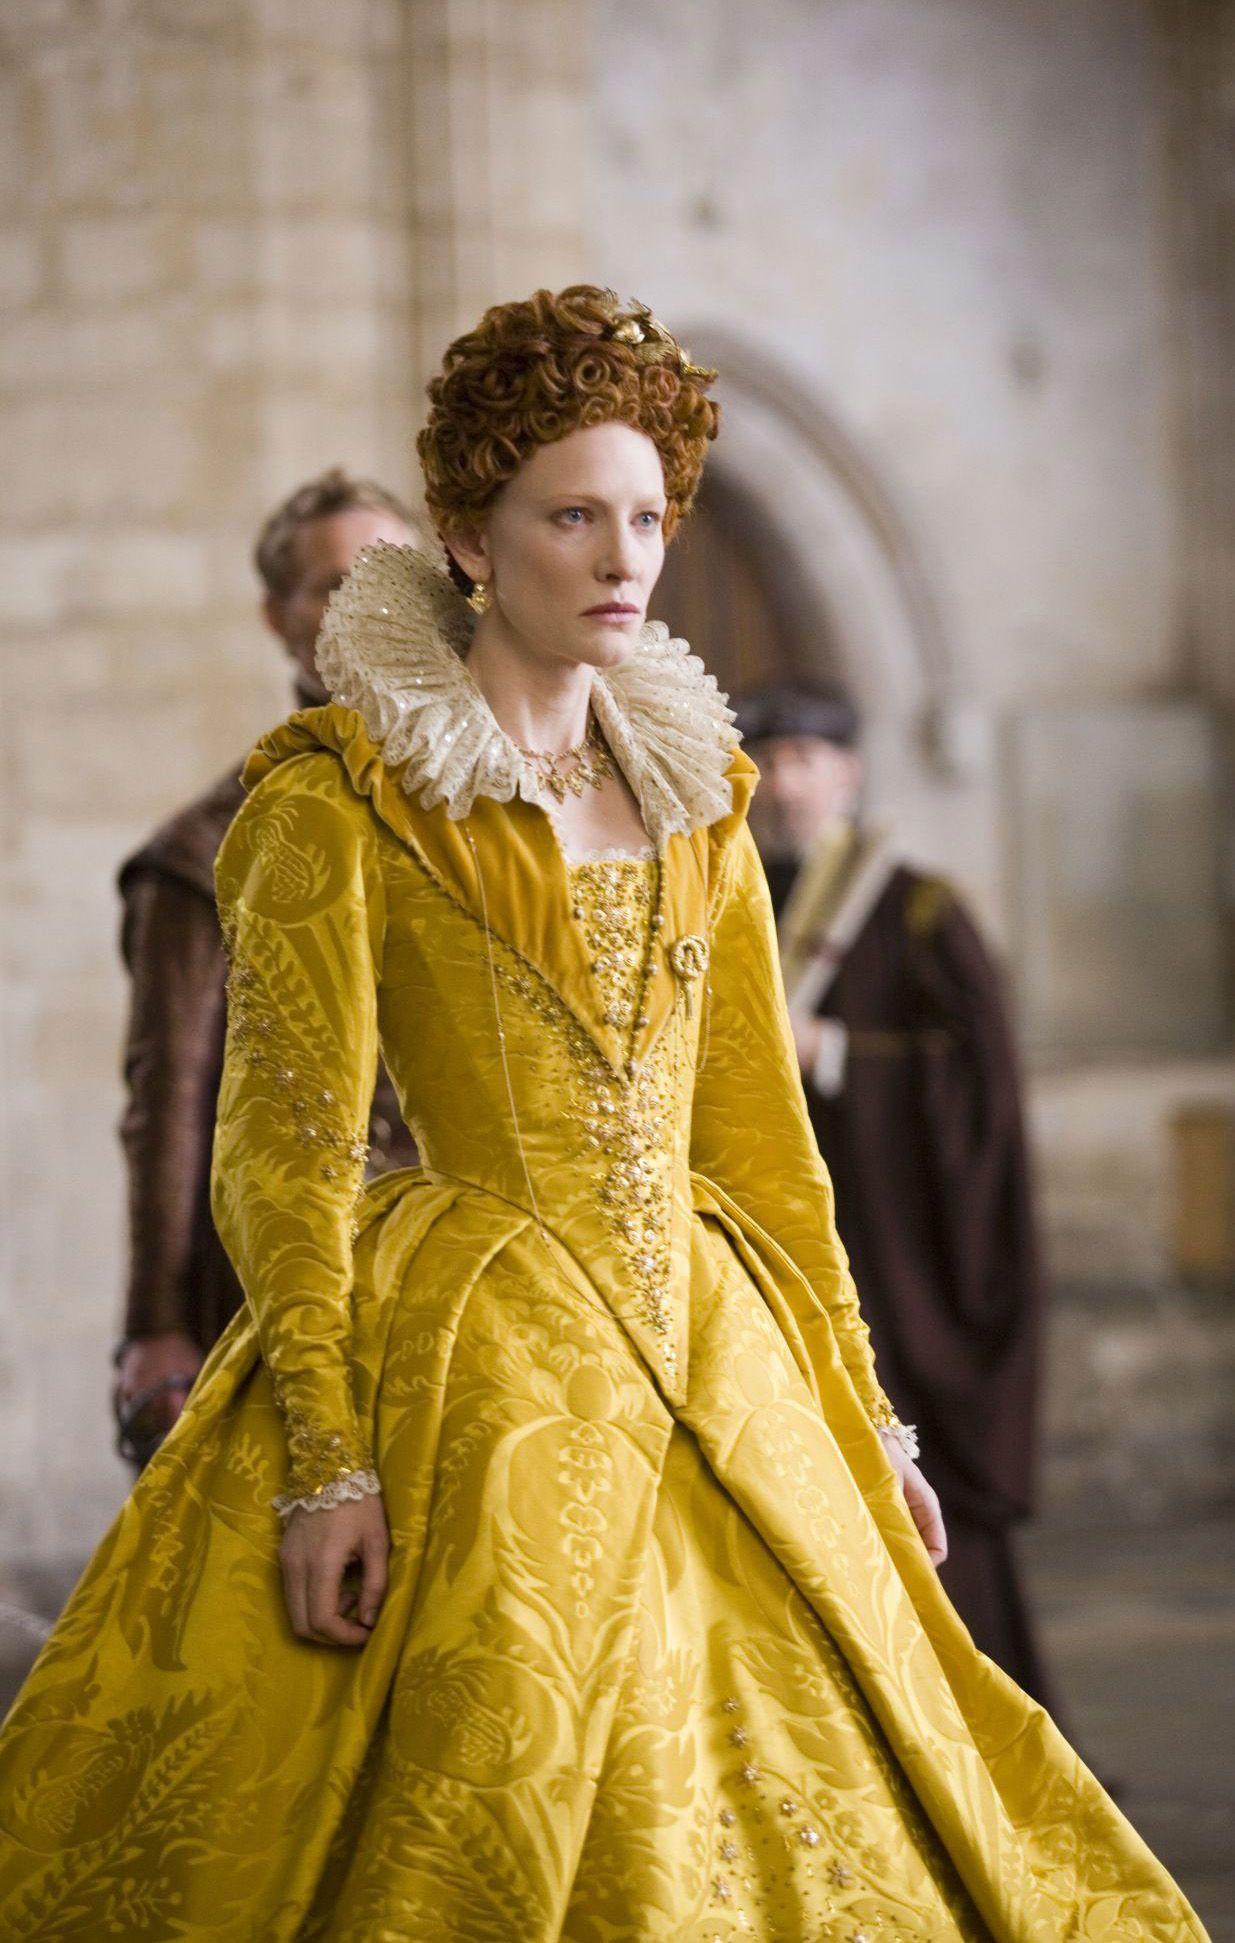 queen elizabeth i cate blanchett elizabeth the golden